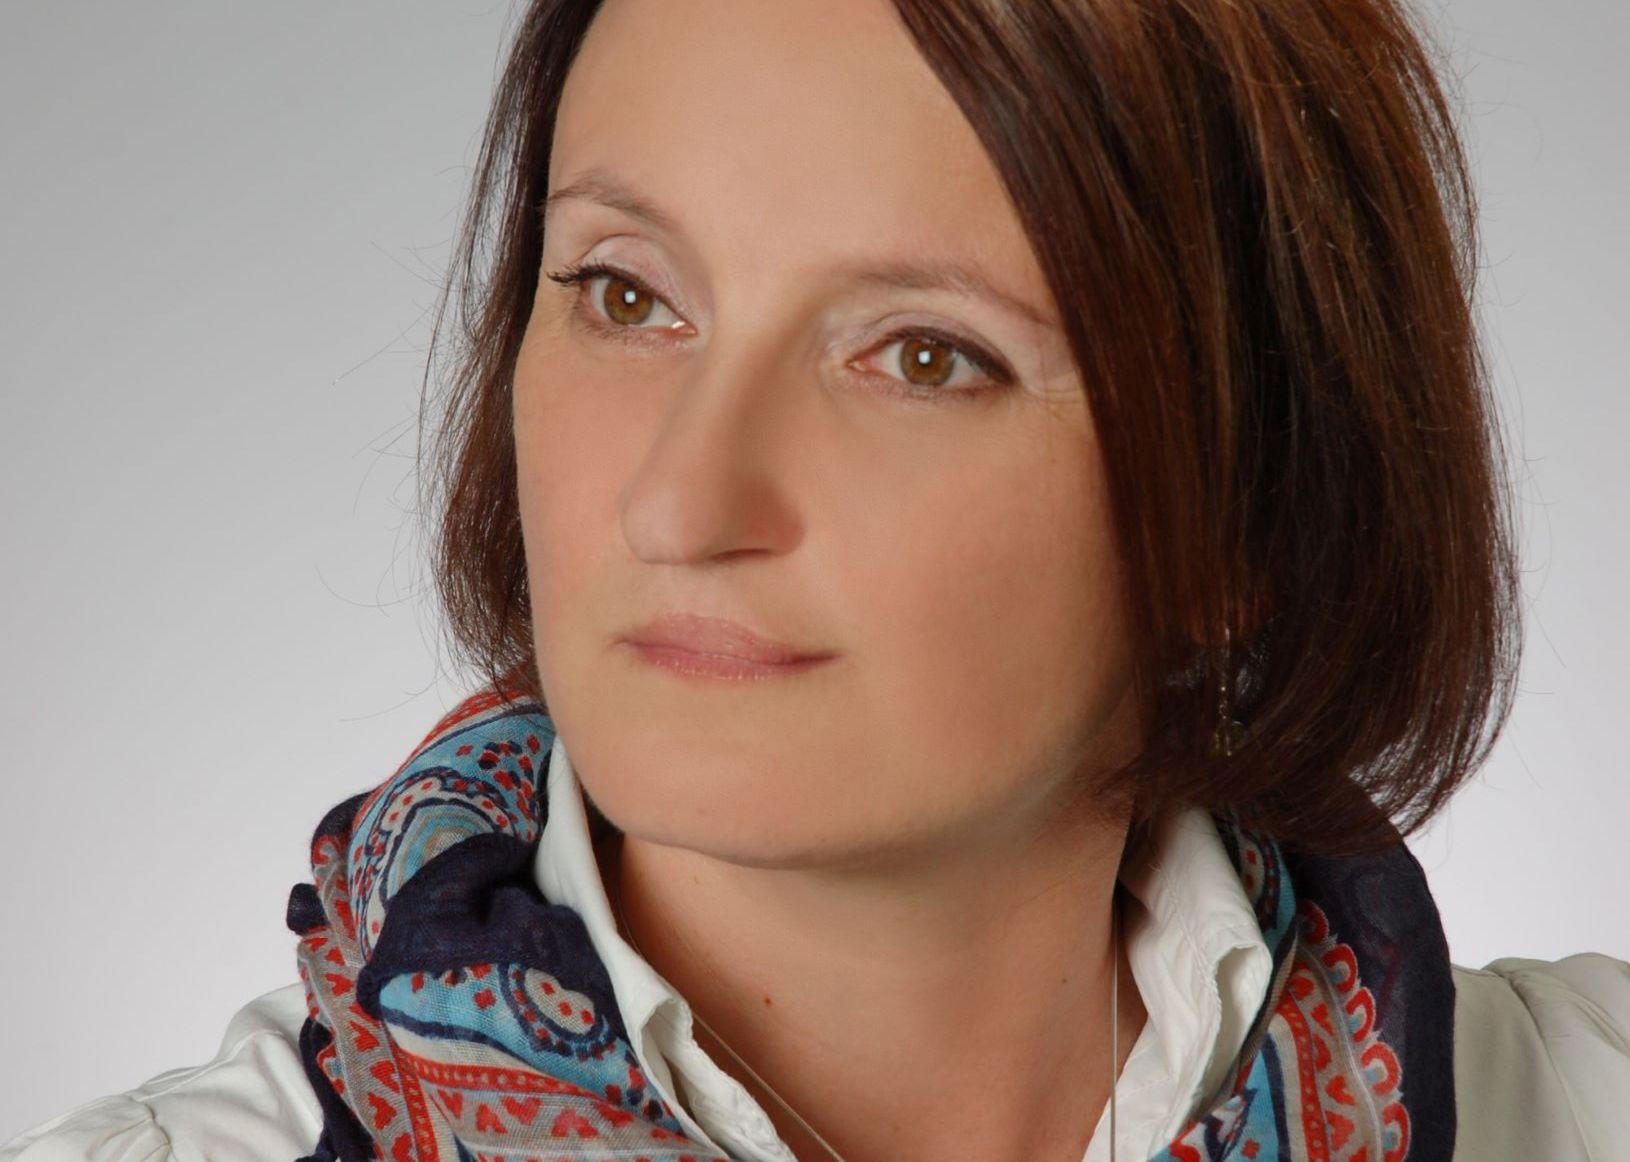 Agnieszka Templin, fot. archiwum